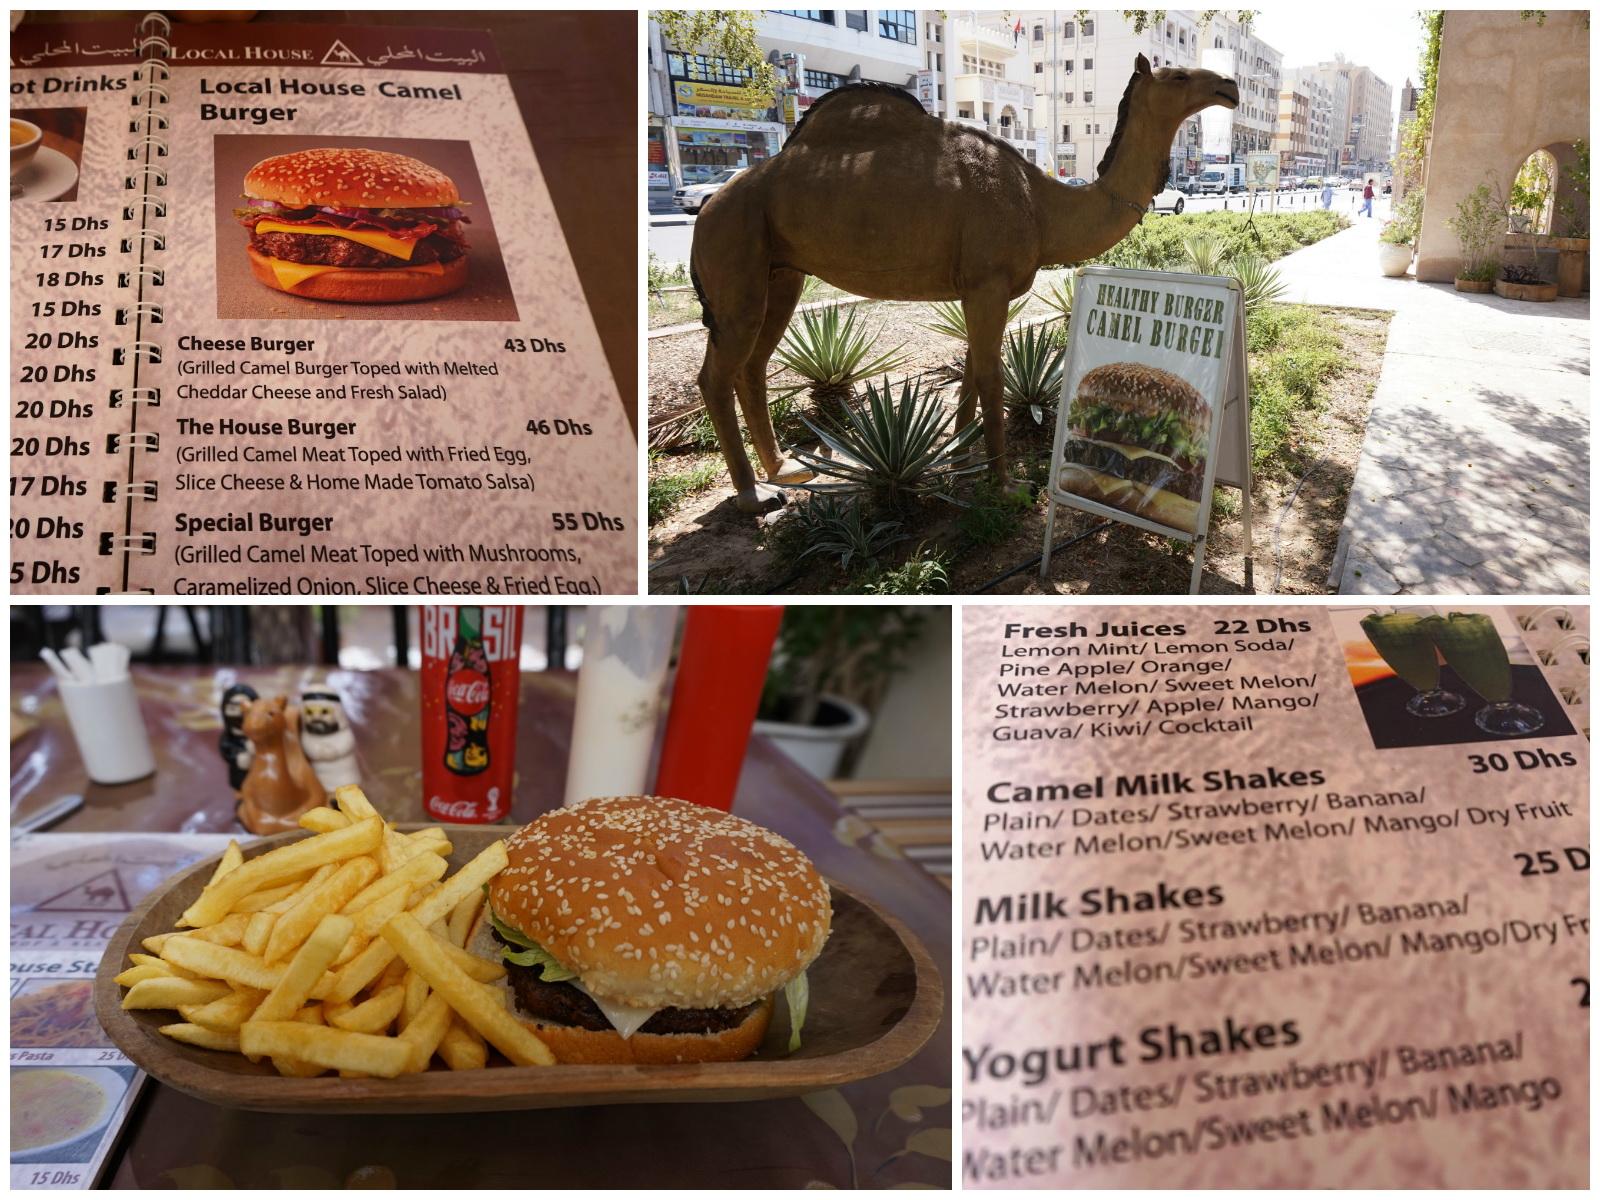 teveburger